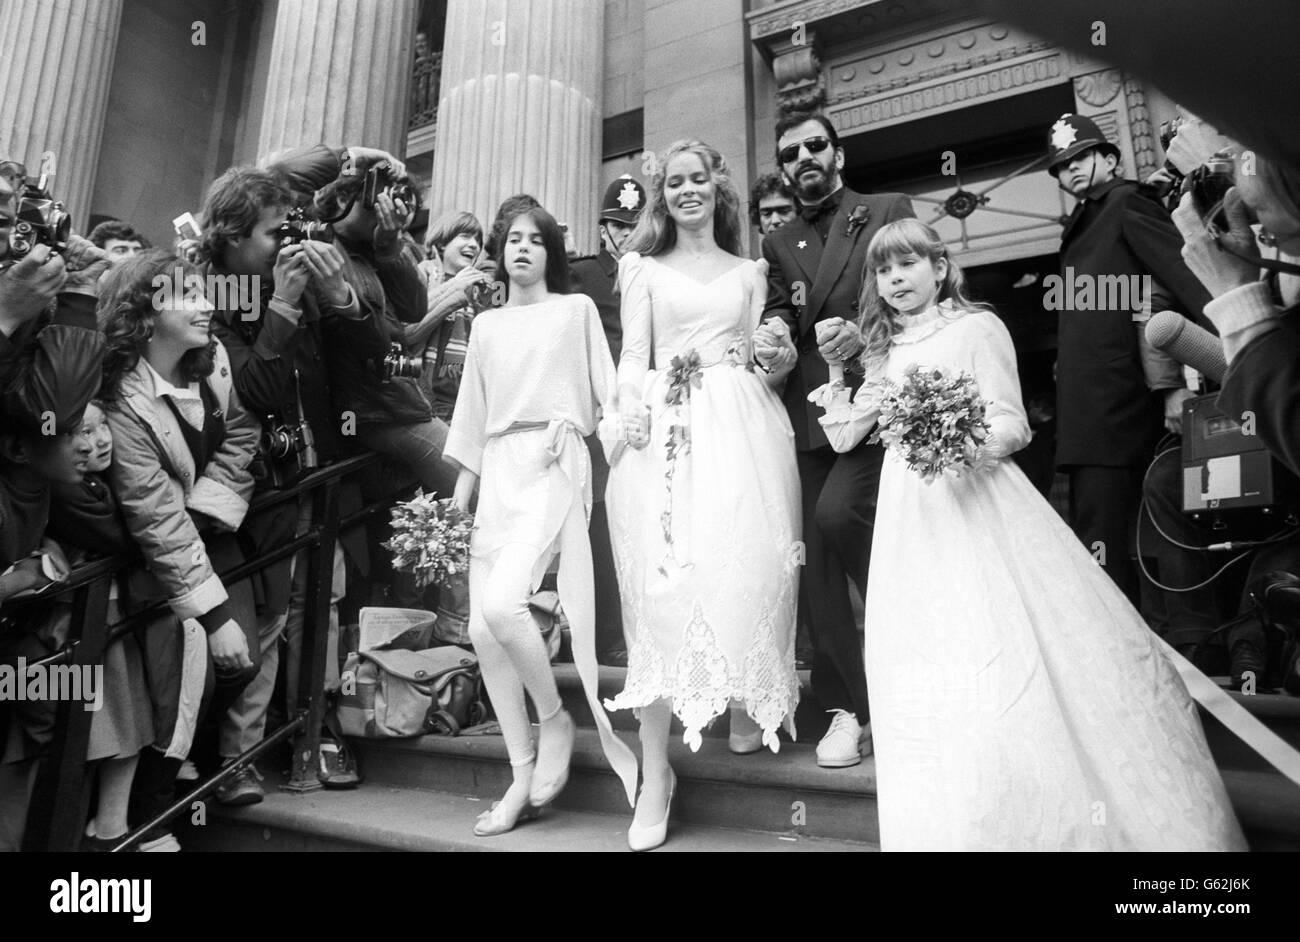 Marylebone registry office celebrity wedding